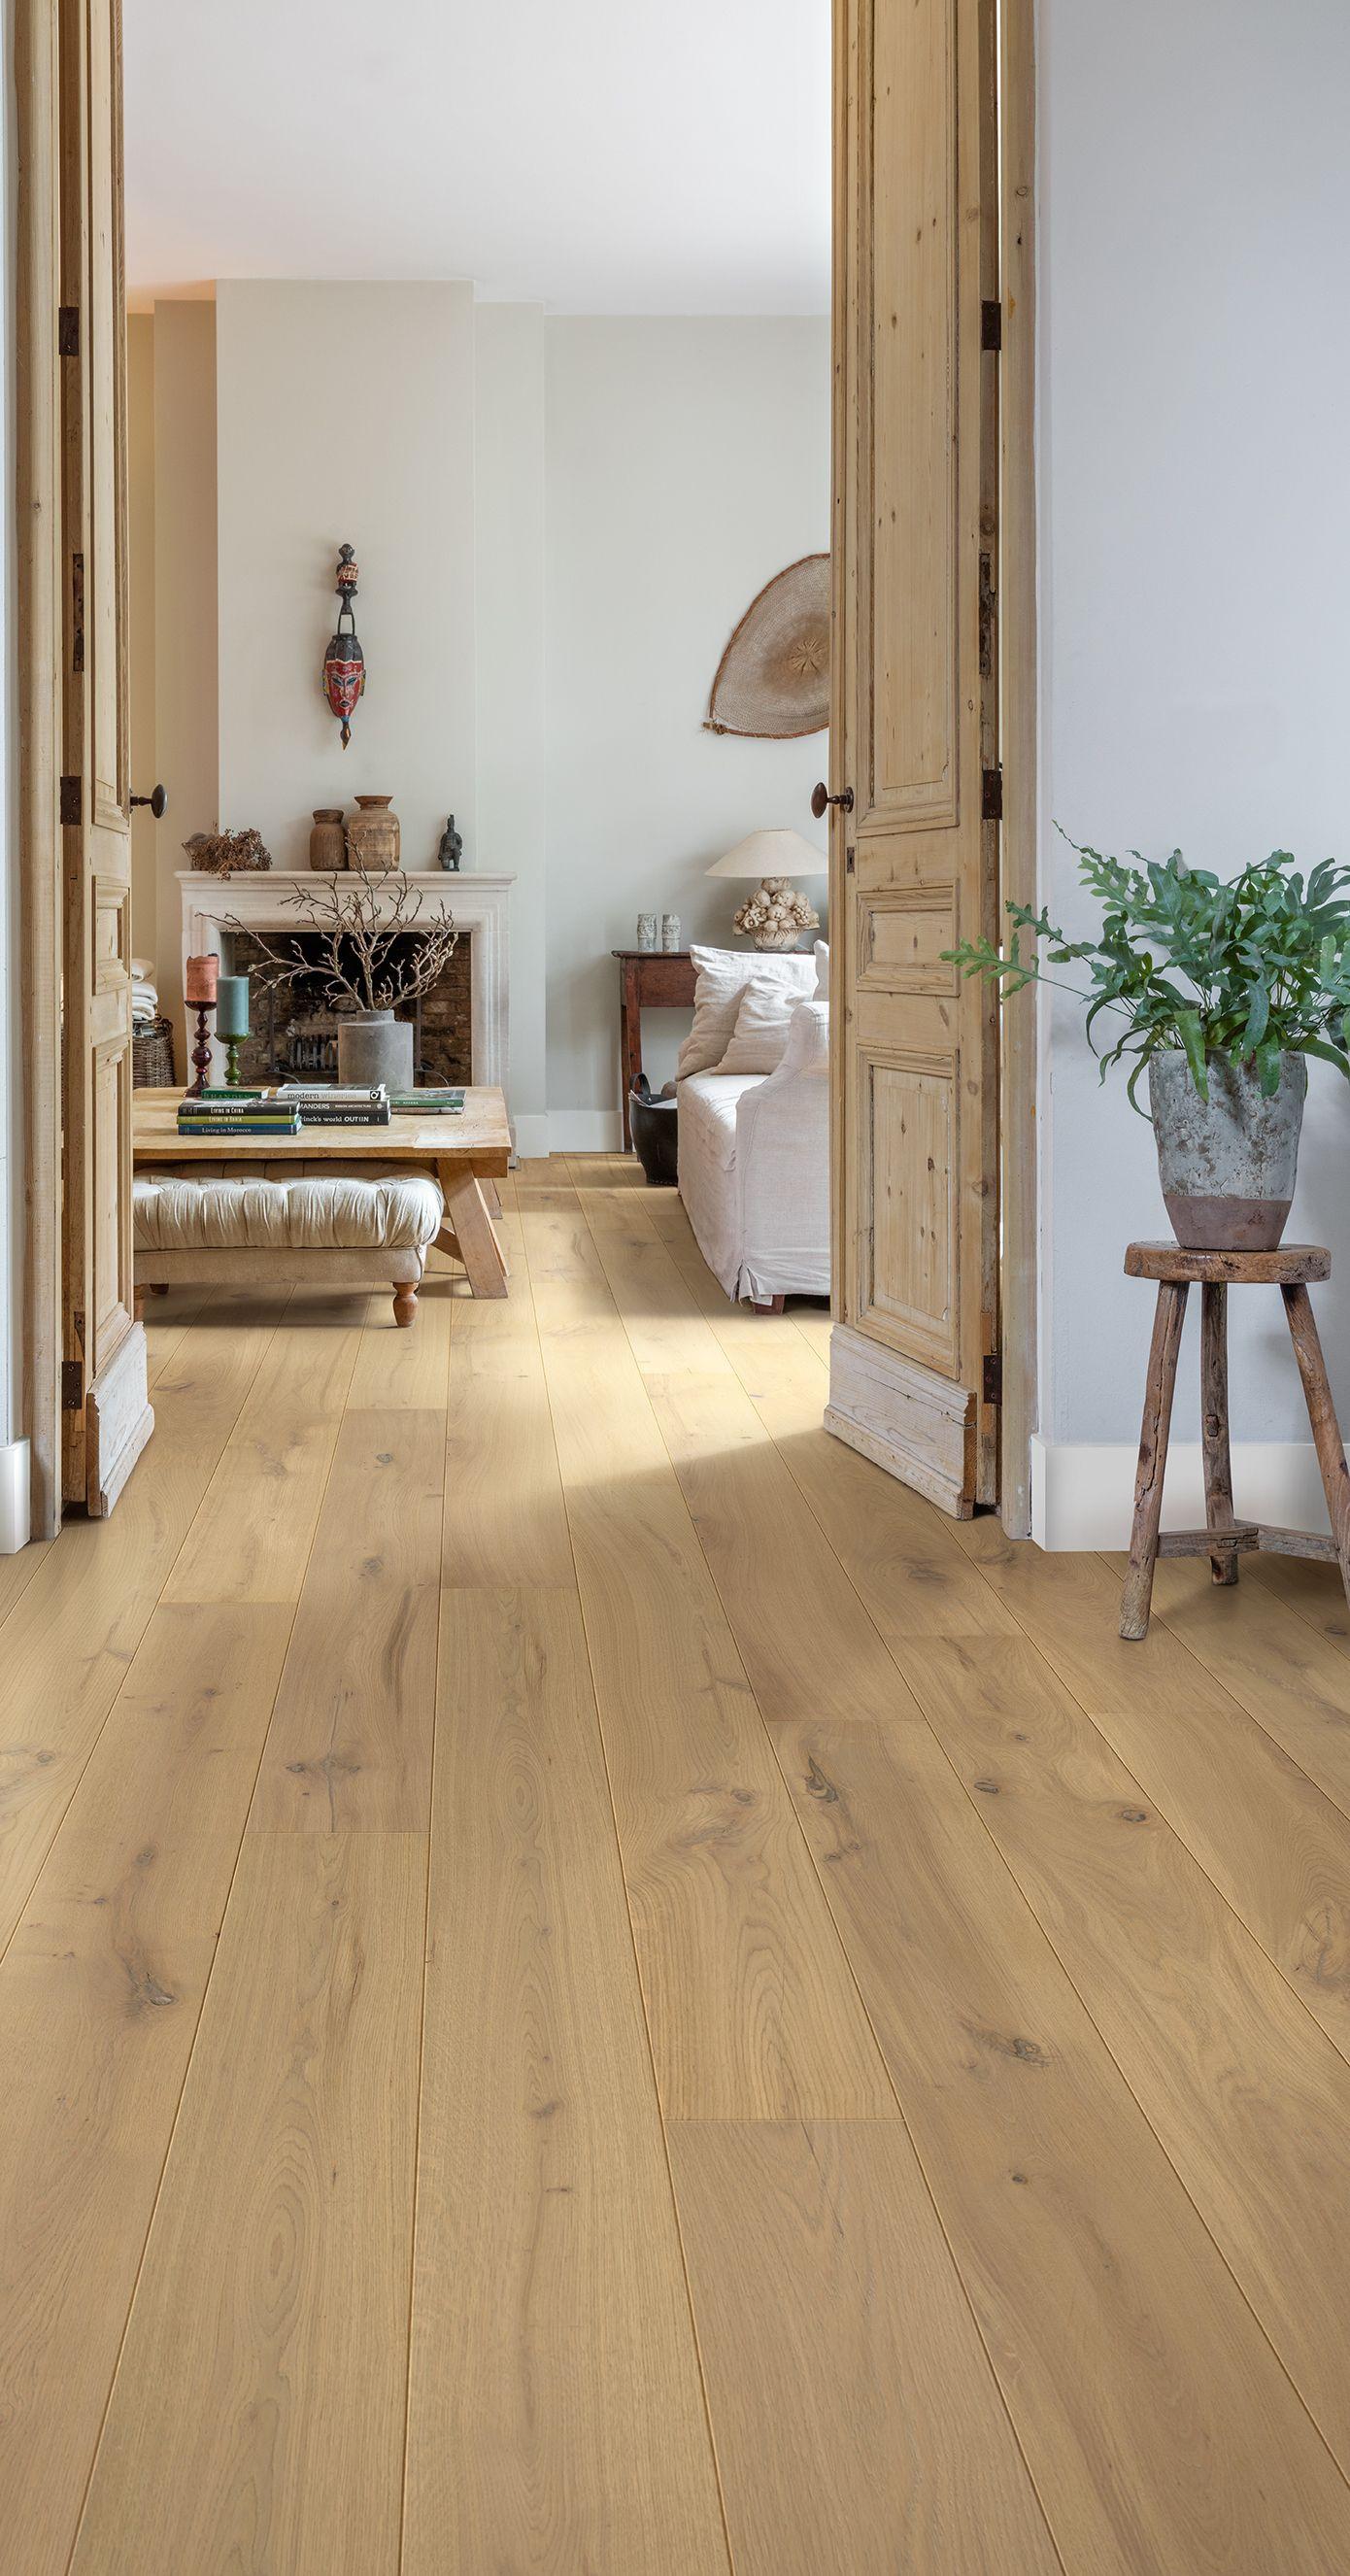 hardwood floor medallion store of laminate flooring company warren oak laminate flooring floor inside laminate flooring company quick step hardwood flooring palazzo summer oak extra matt